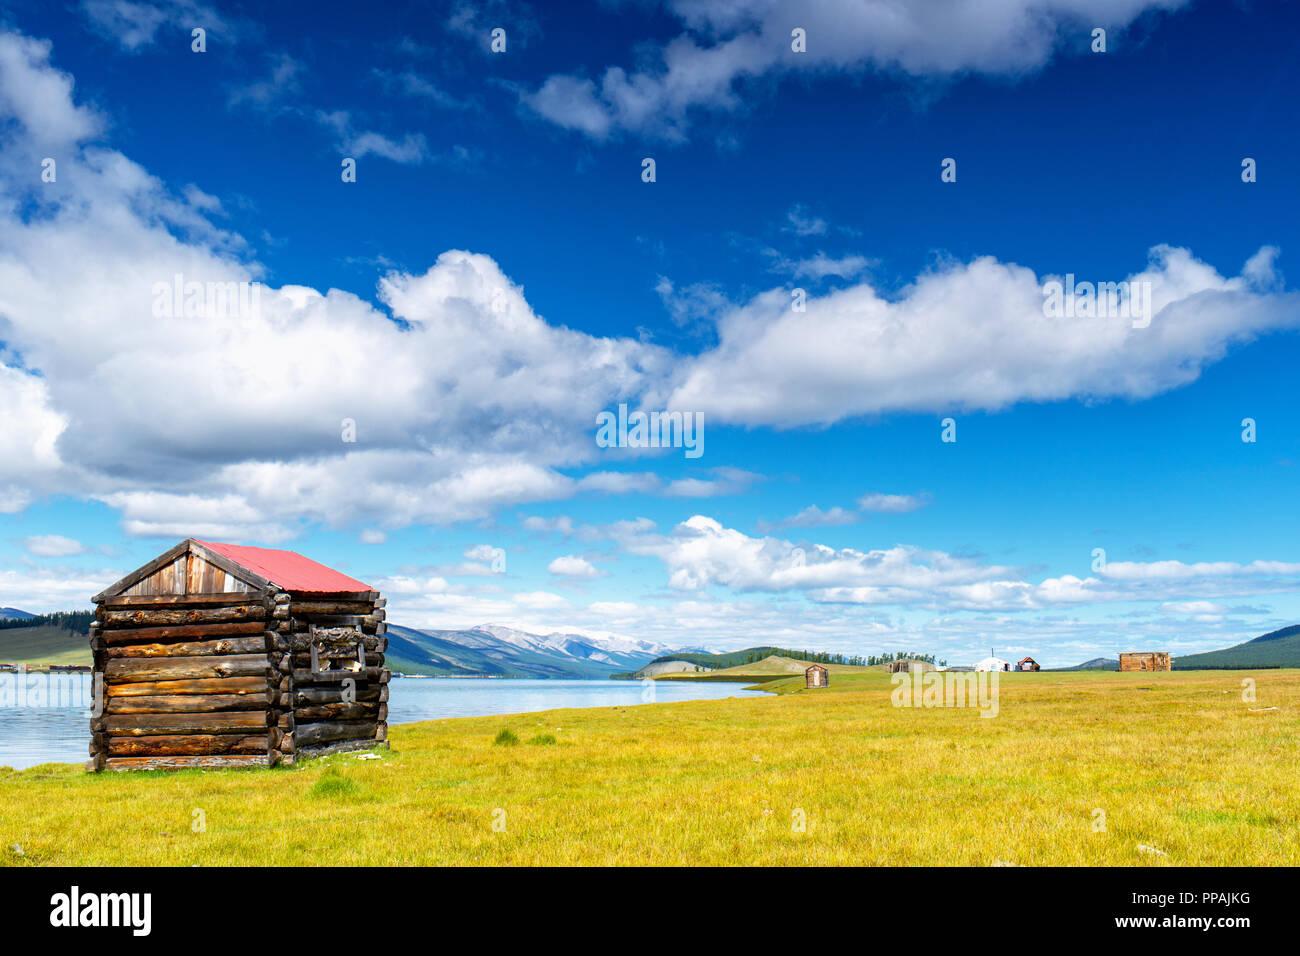 Piccola capanna e una marcia al Lago Khovsgol shore, Khatgal, Mongolia Immagini Stock